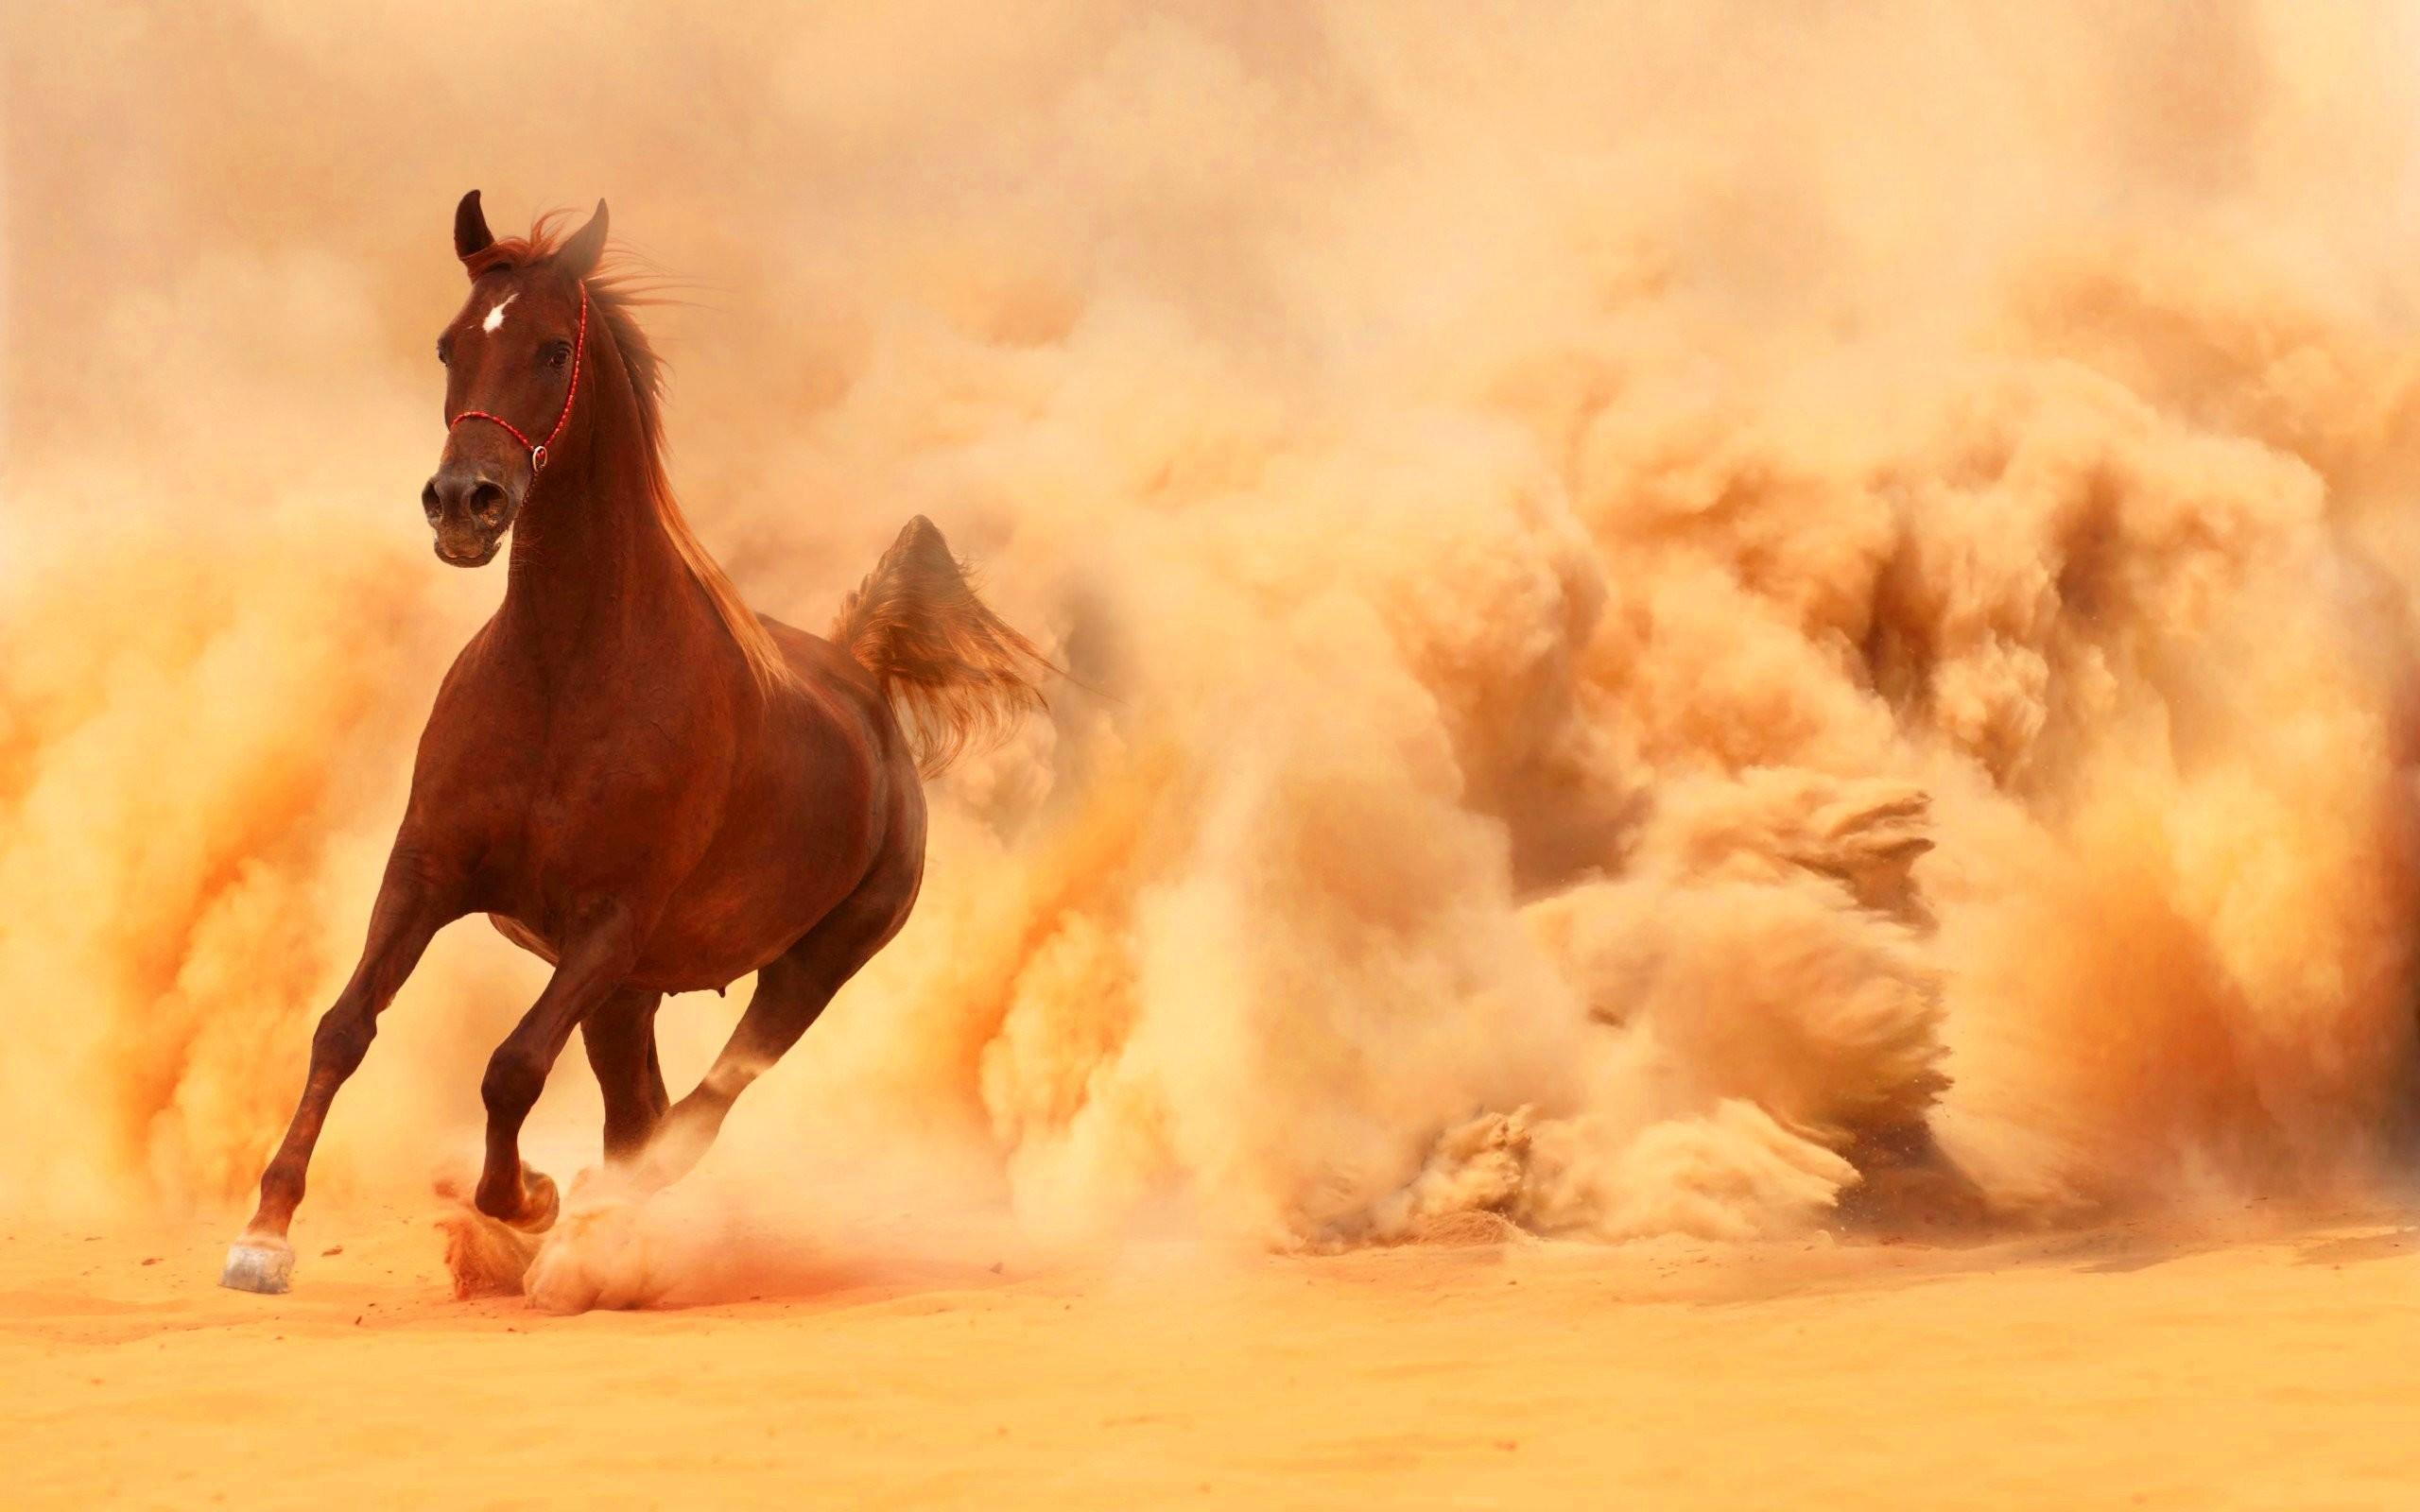 Arabian Horse Wallpaper 55 Images